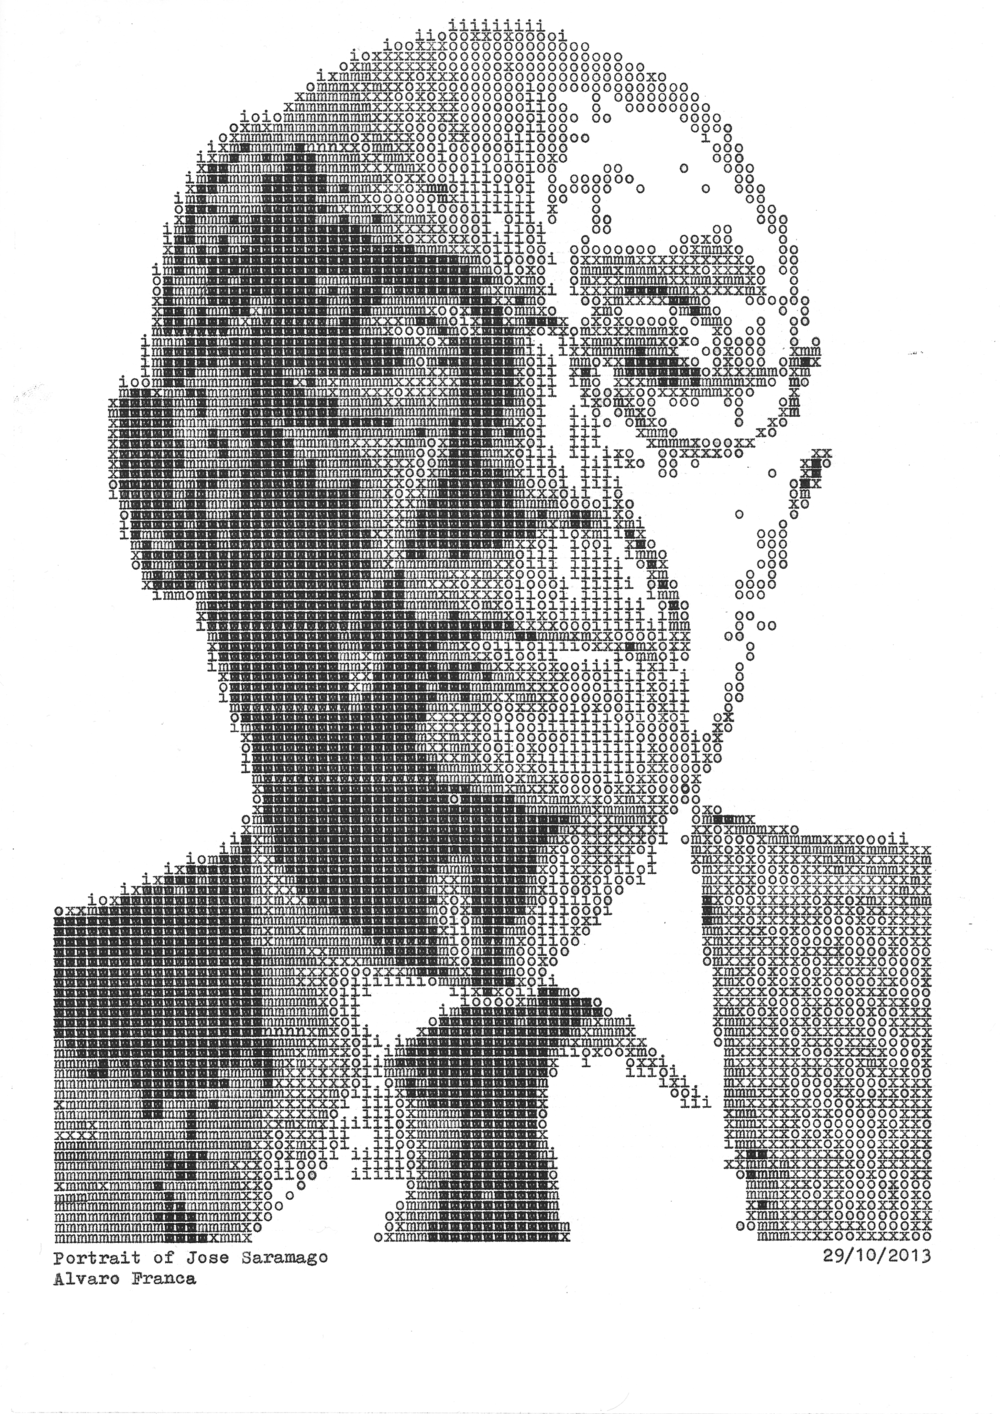 Saramago.png